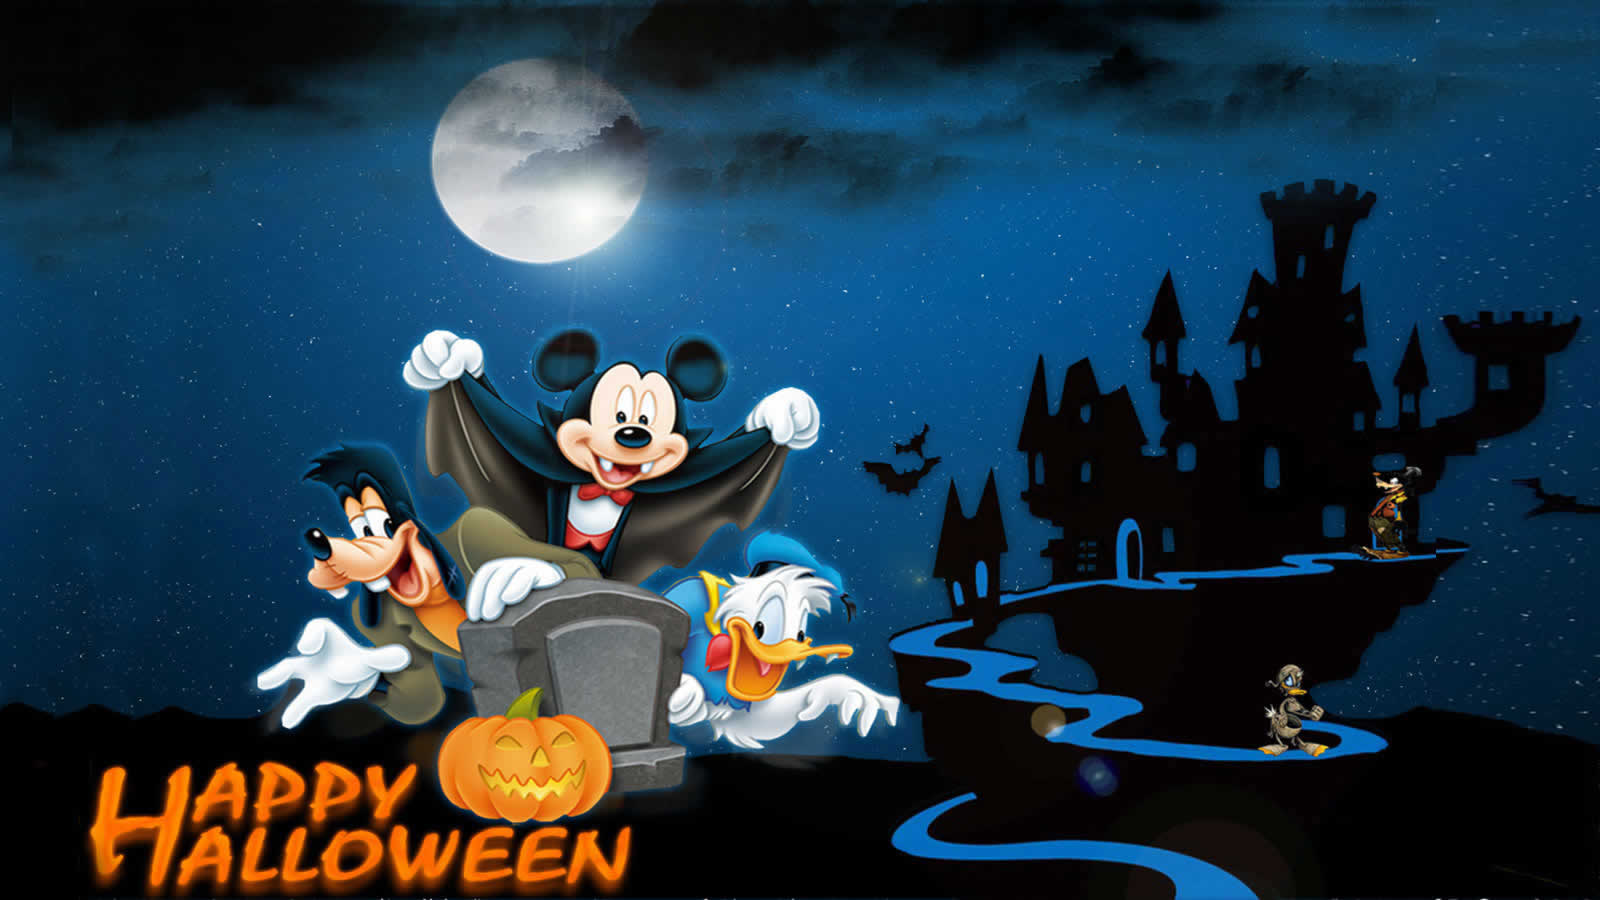 Halloween Desktop Clipart 20 Free Cliparts Download Images